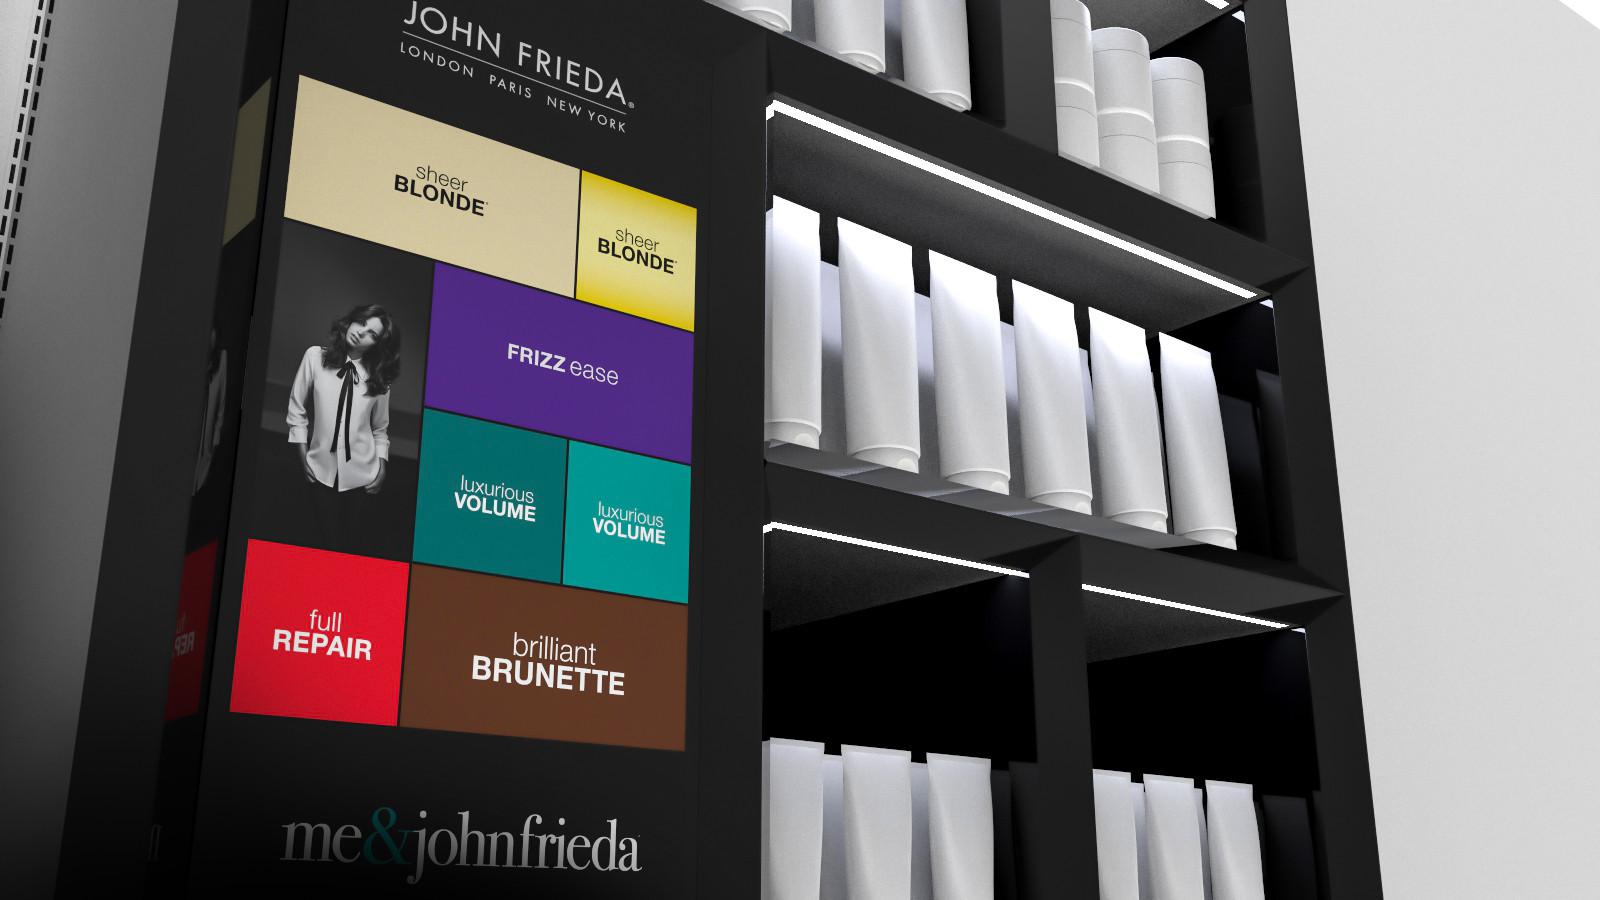 John Frieda 1